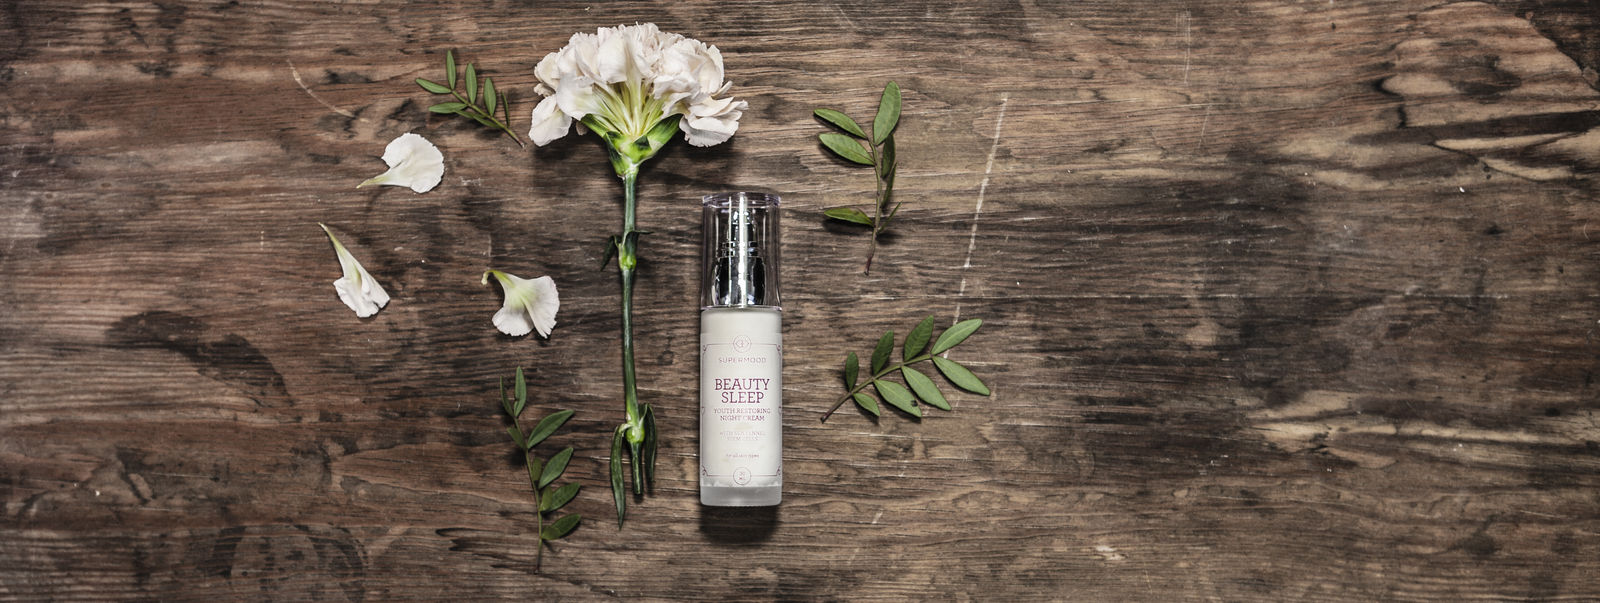 Beauty Sleep: youth restoring night cream.